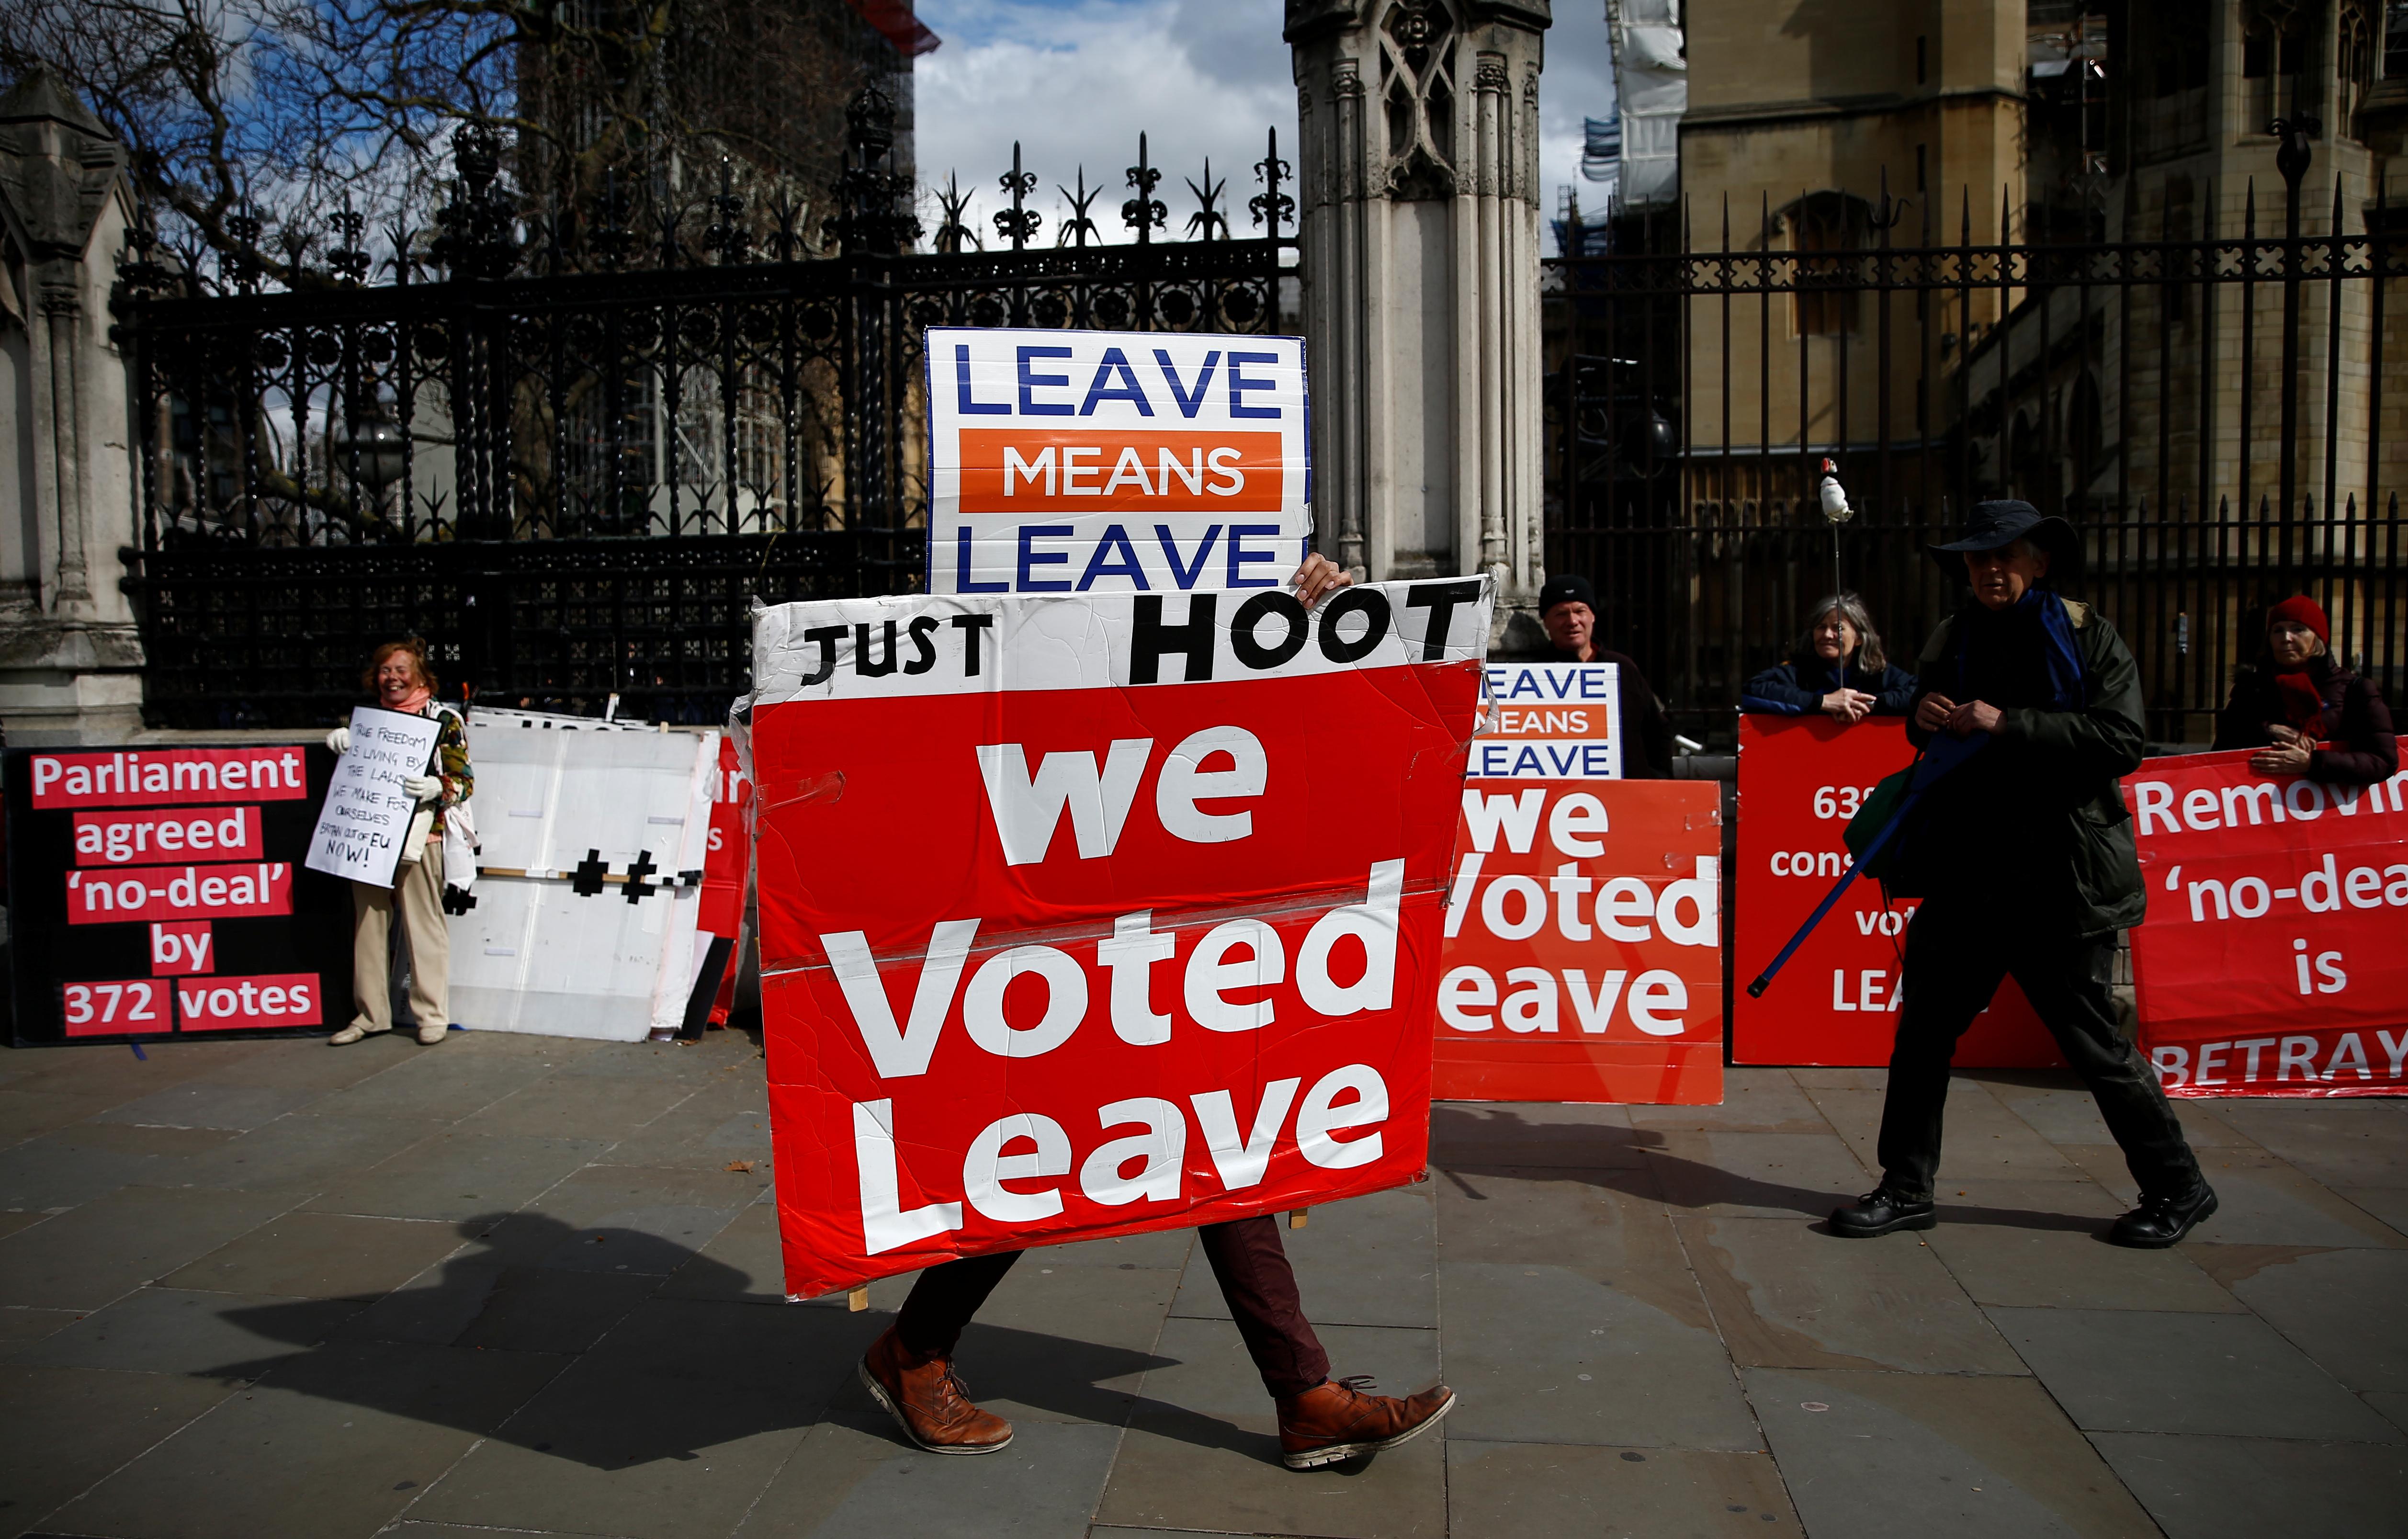 Brexit Endgame: British Parliament Faces Naked Protestors